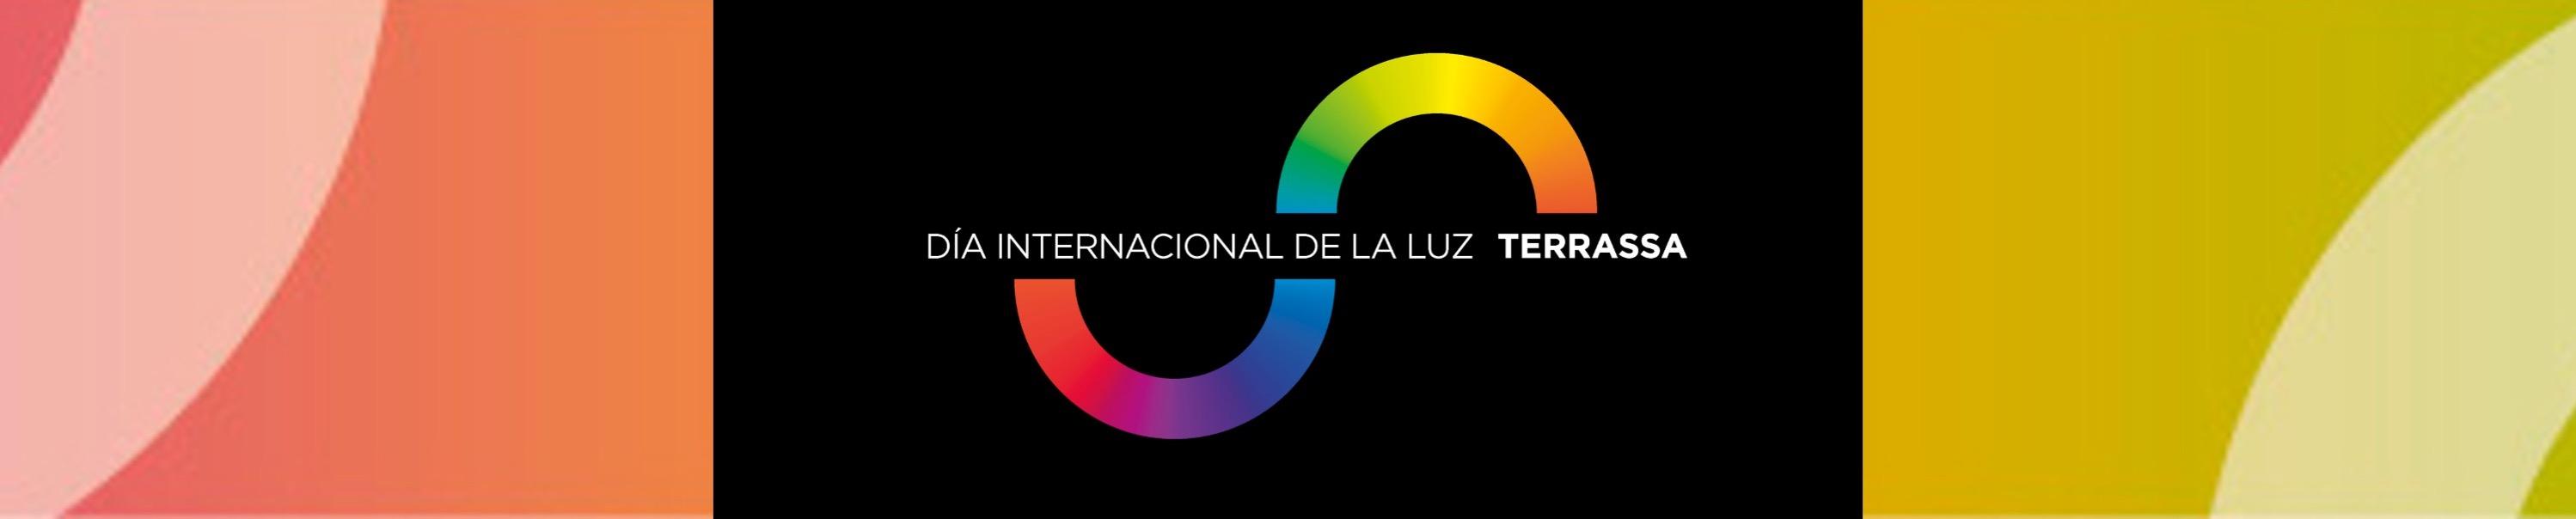 Carrusel Dia Internacional de la Luz 2021